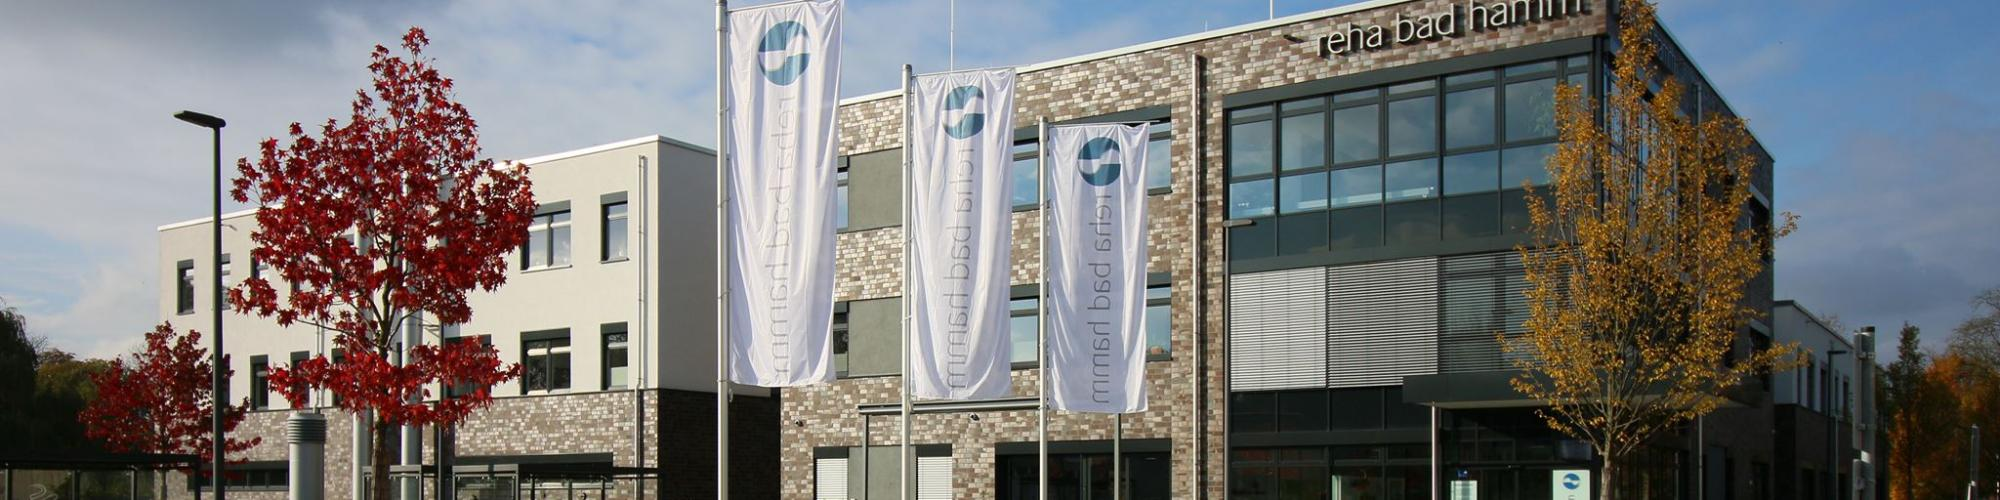 Ambulante Reha Bad Hamm GmbH